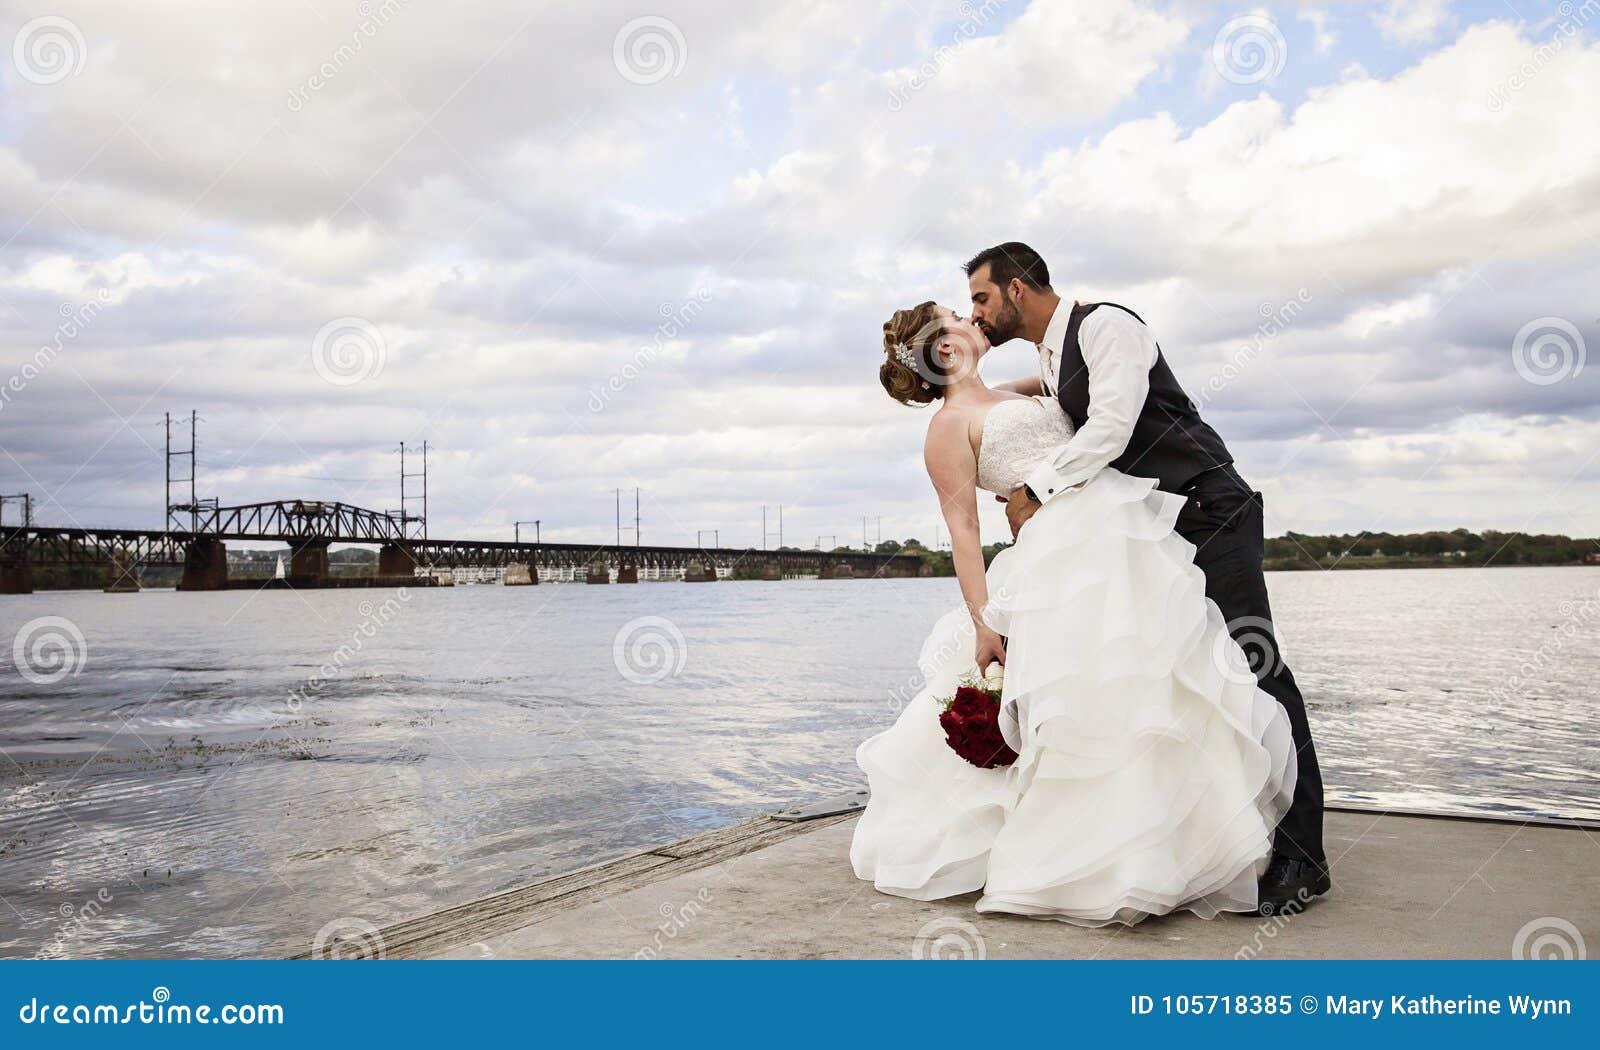 Wedding kiss on dock